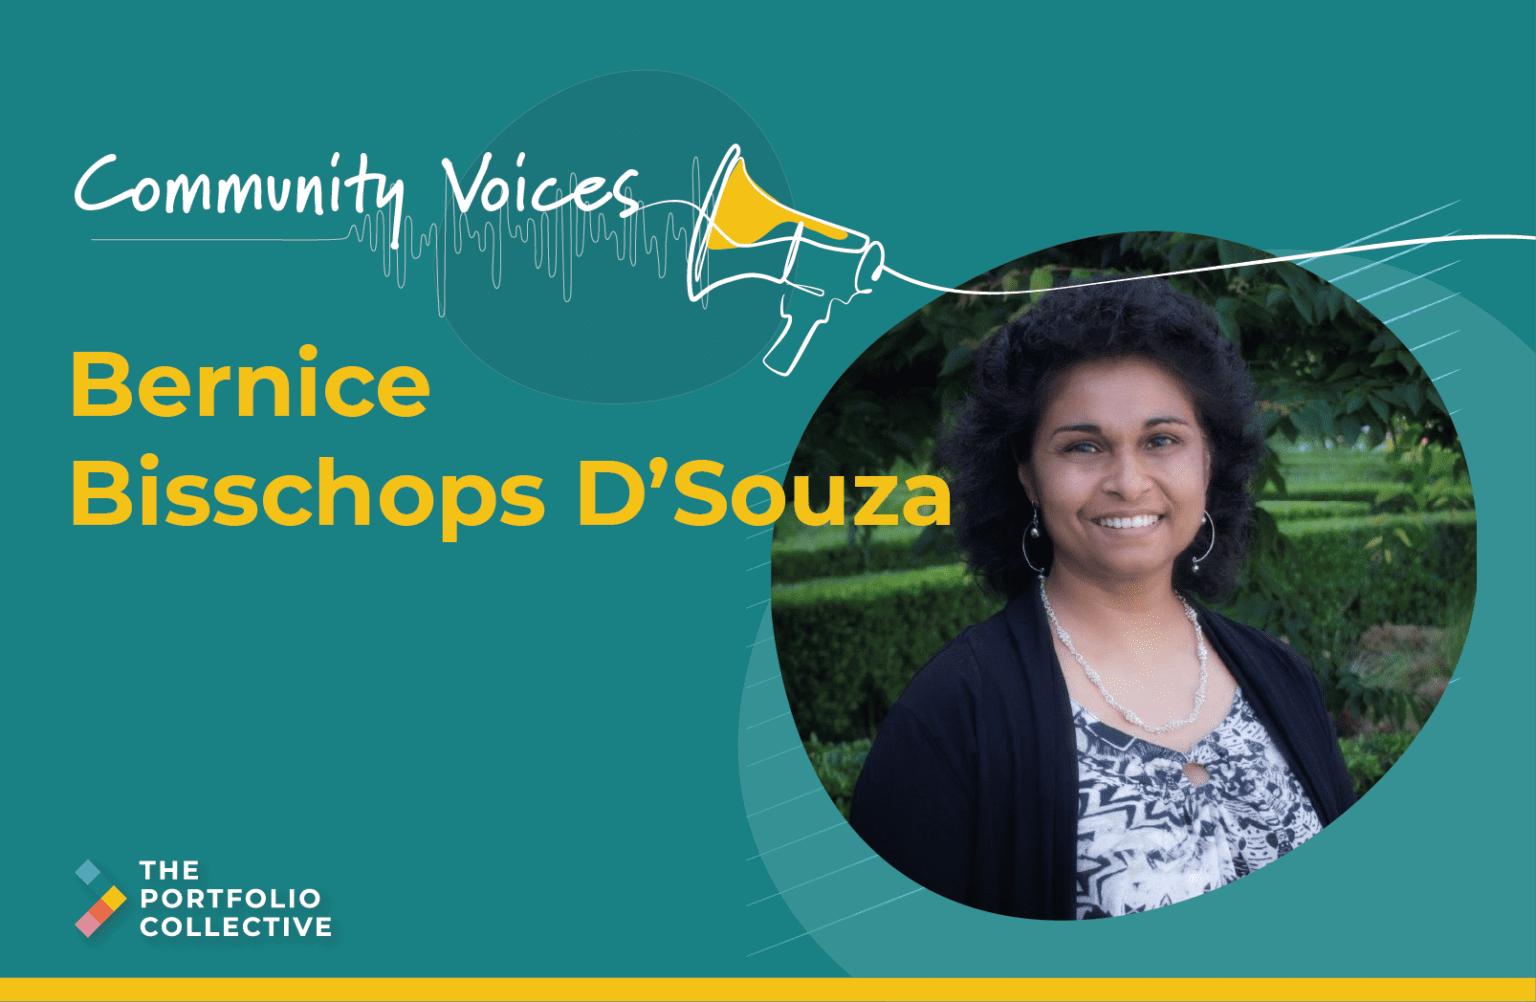 Finding purpose in community: Bernice's story